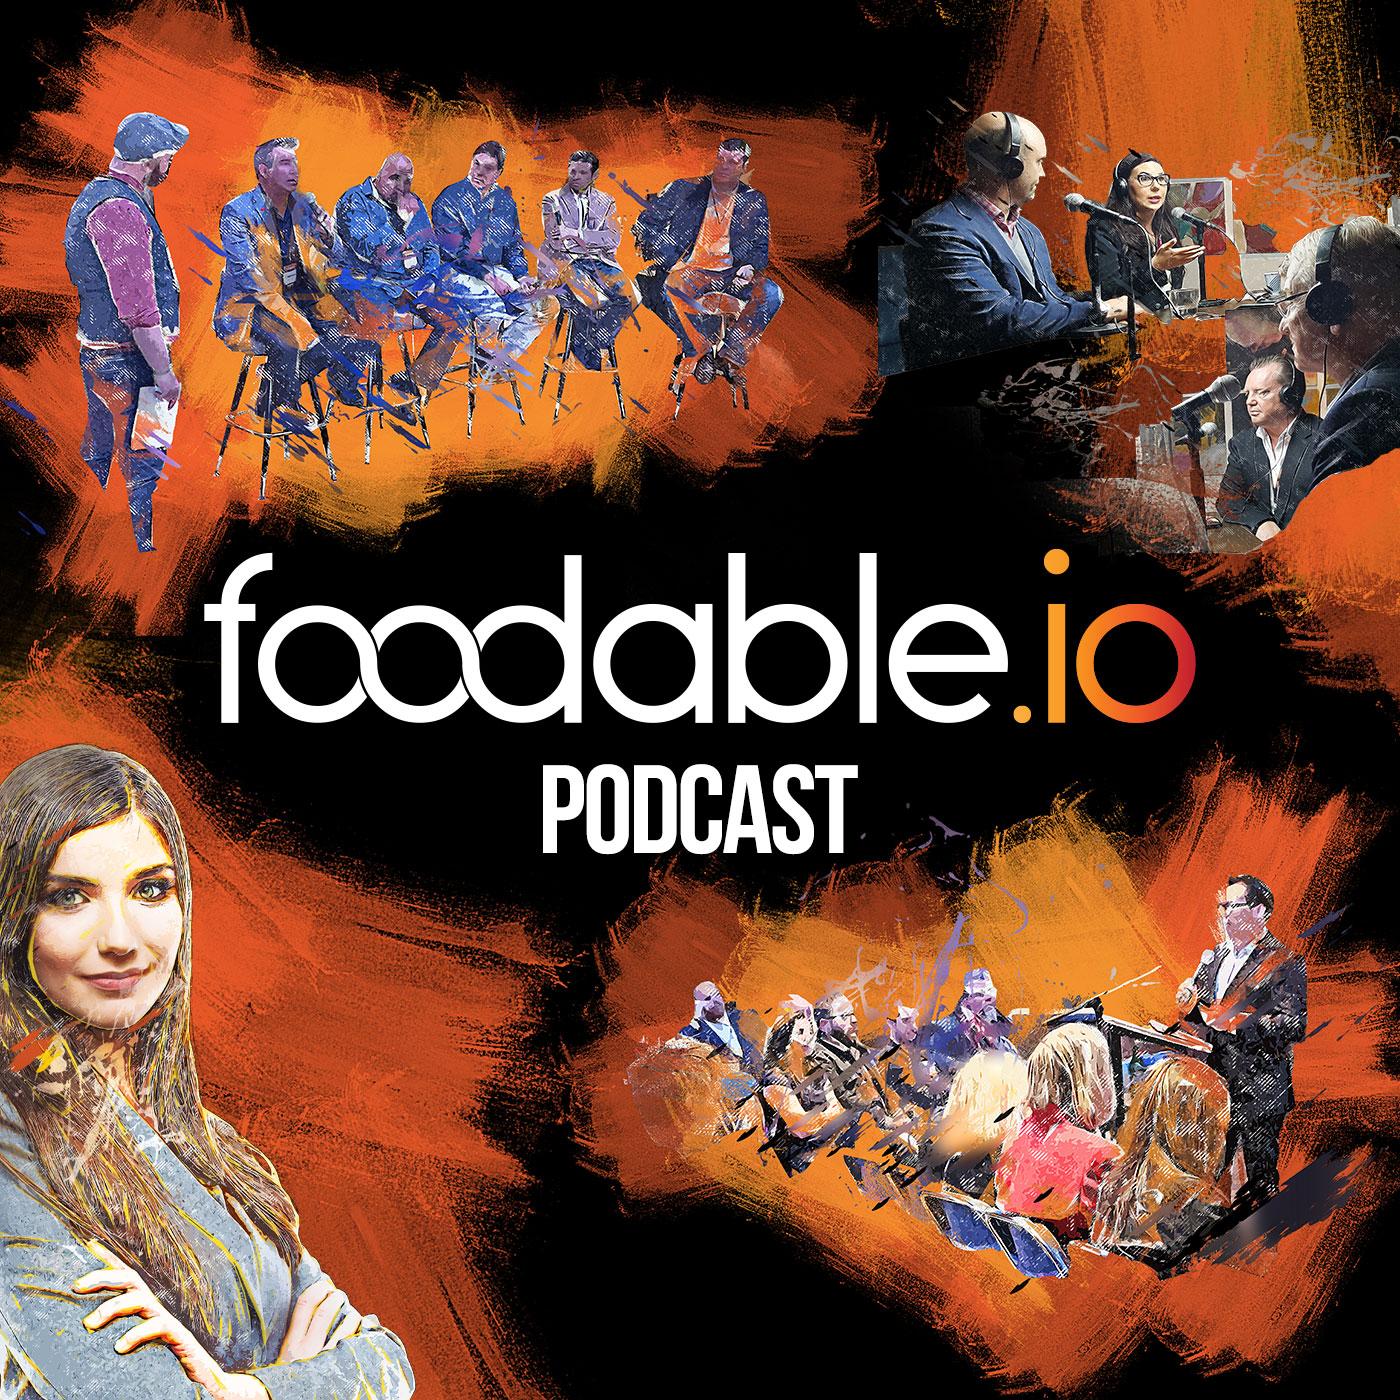 Foodable.io_Podcast-itunes01.jpg